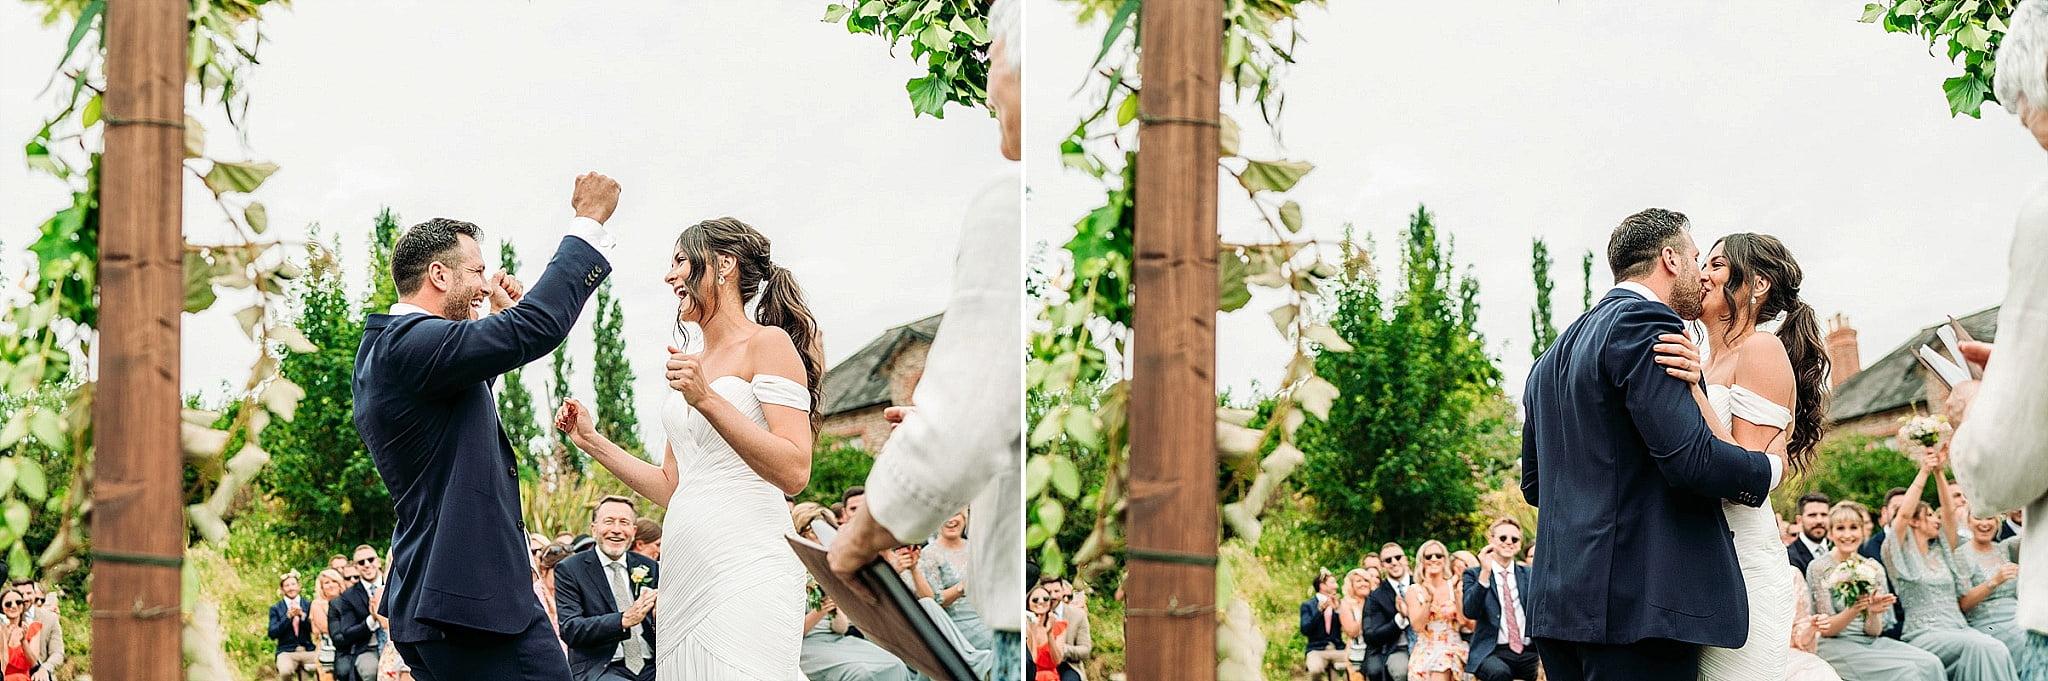 Lyde Court Wedding - Becky + Rhys 41